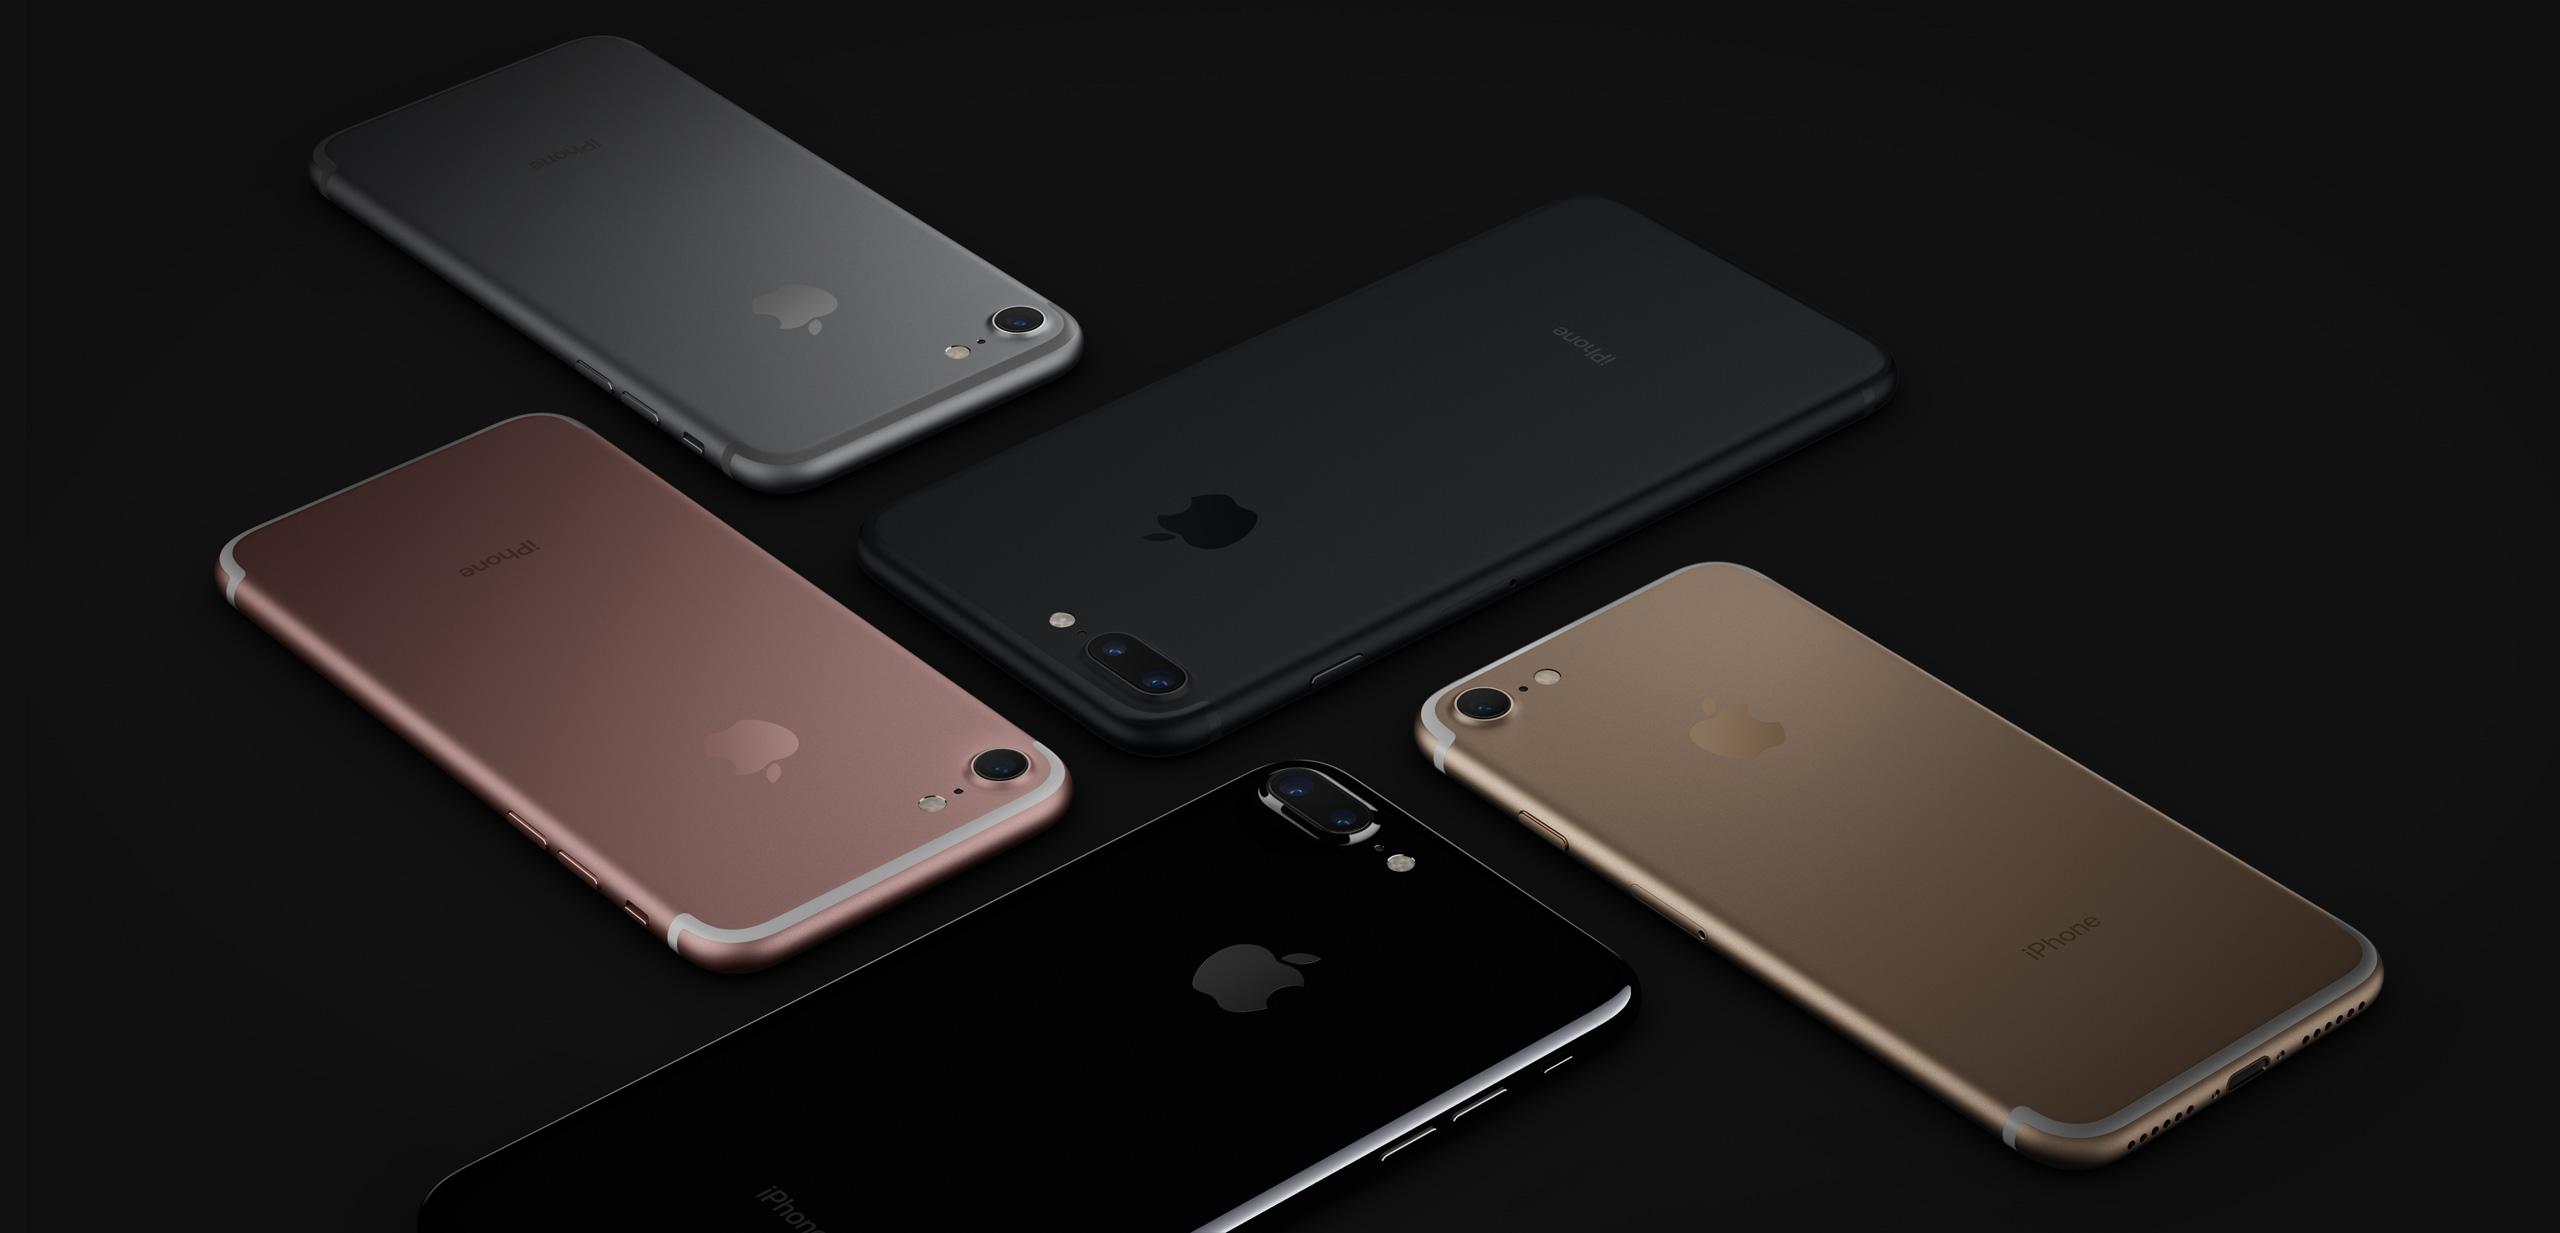 sihirli-elma-iphone-7-onemli-10-konu-4.jpeg